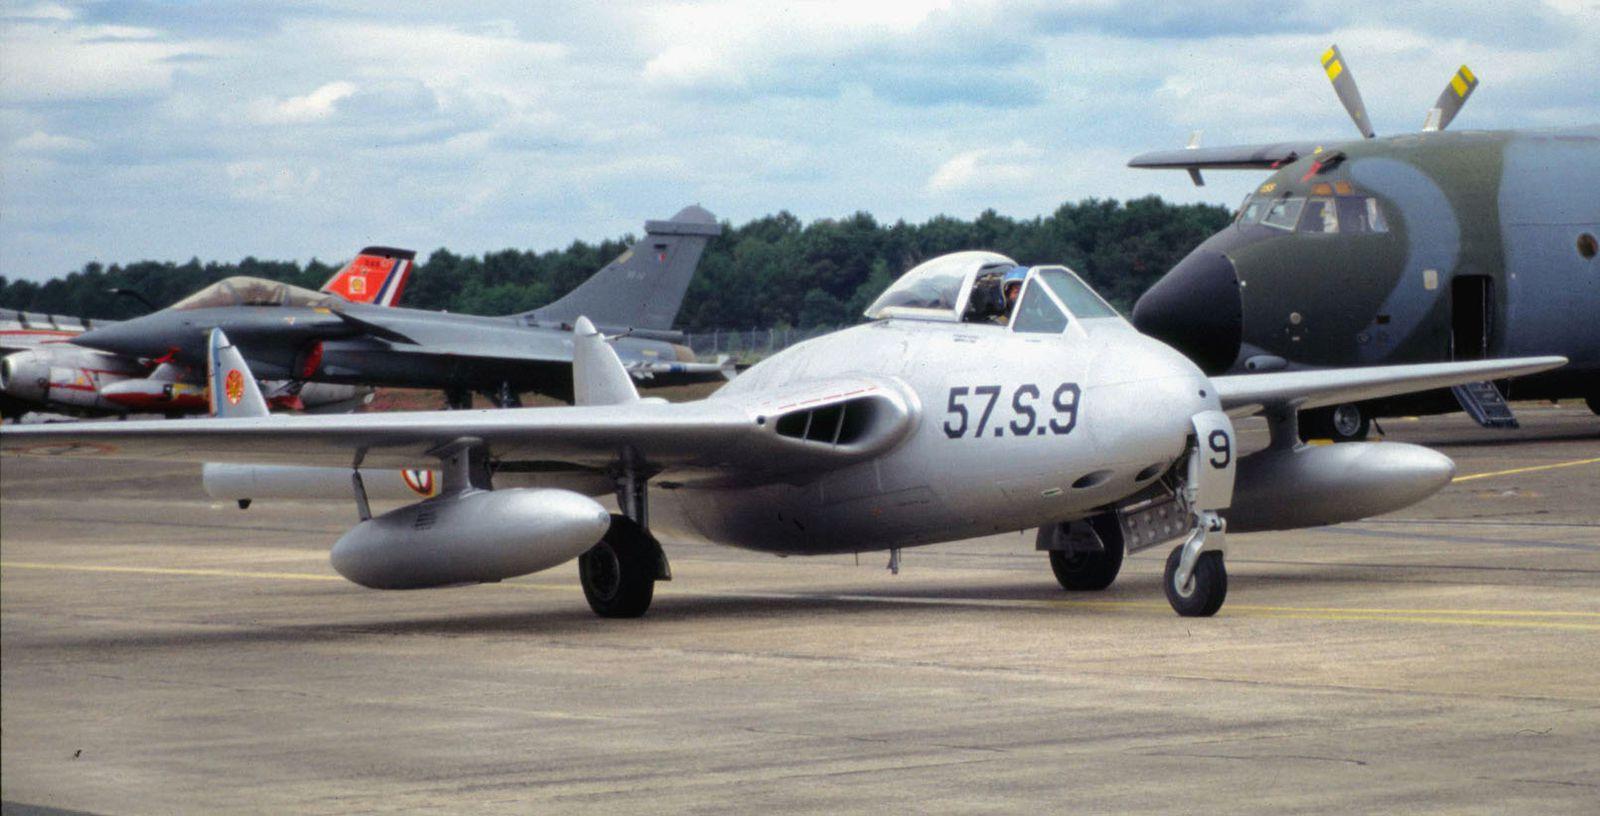 Le DH-100 Vampire F-AZHJ, vendu à l'étranger